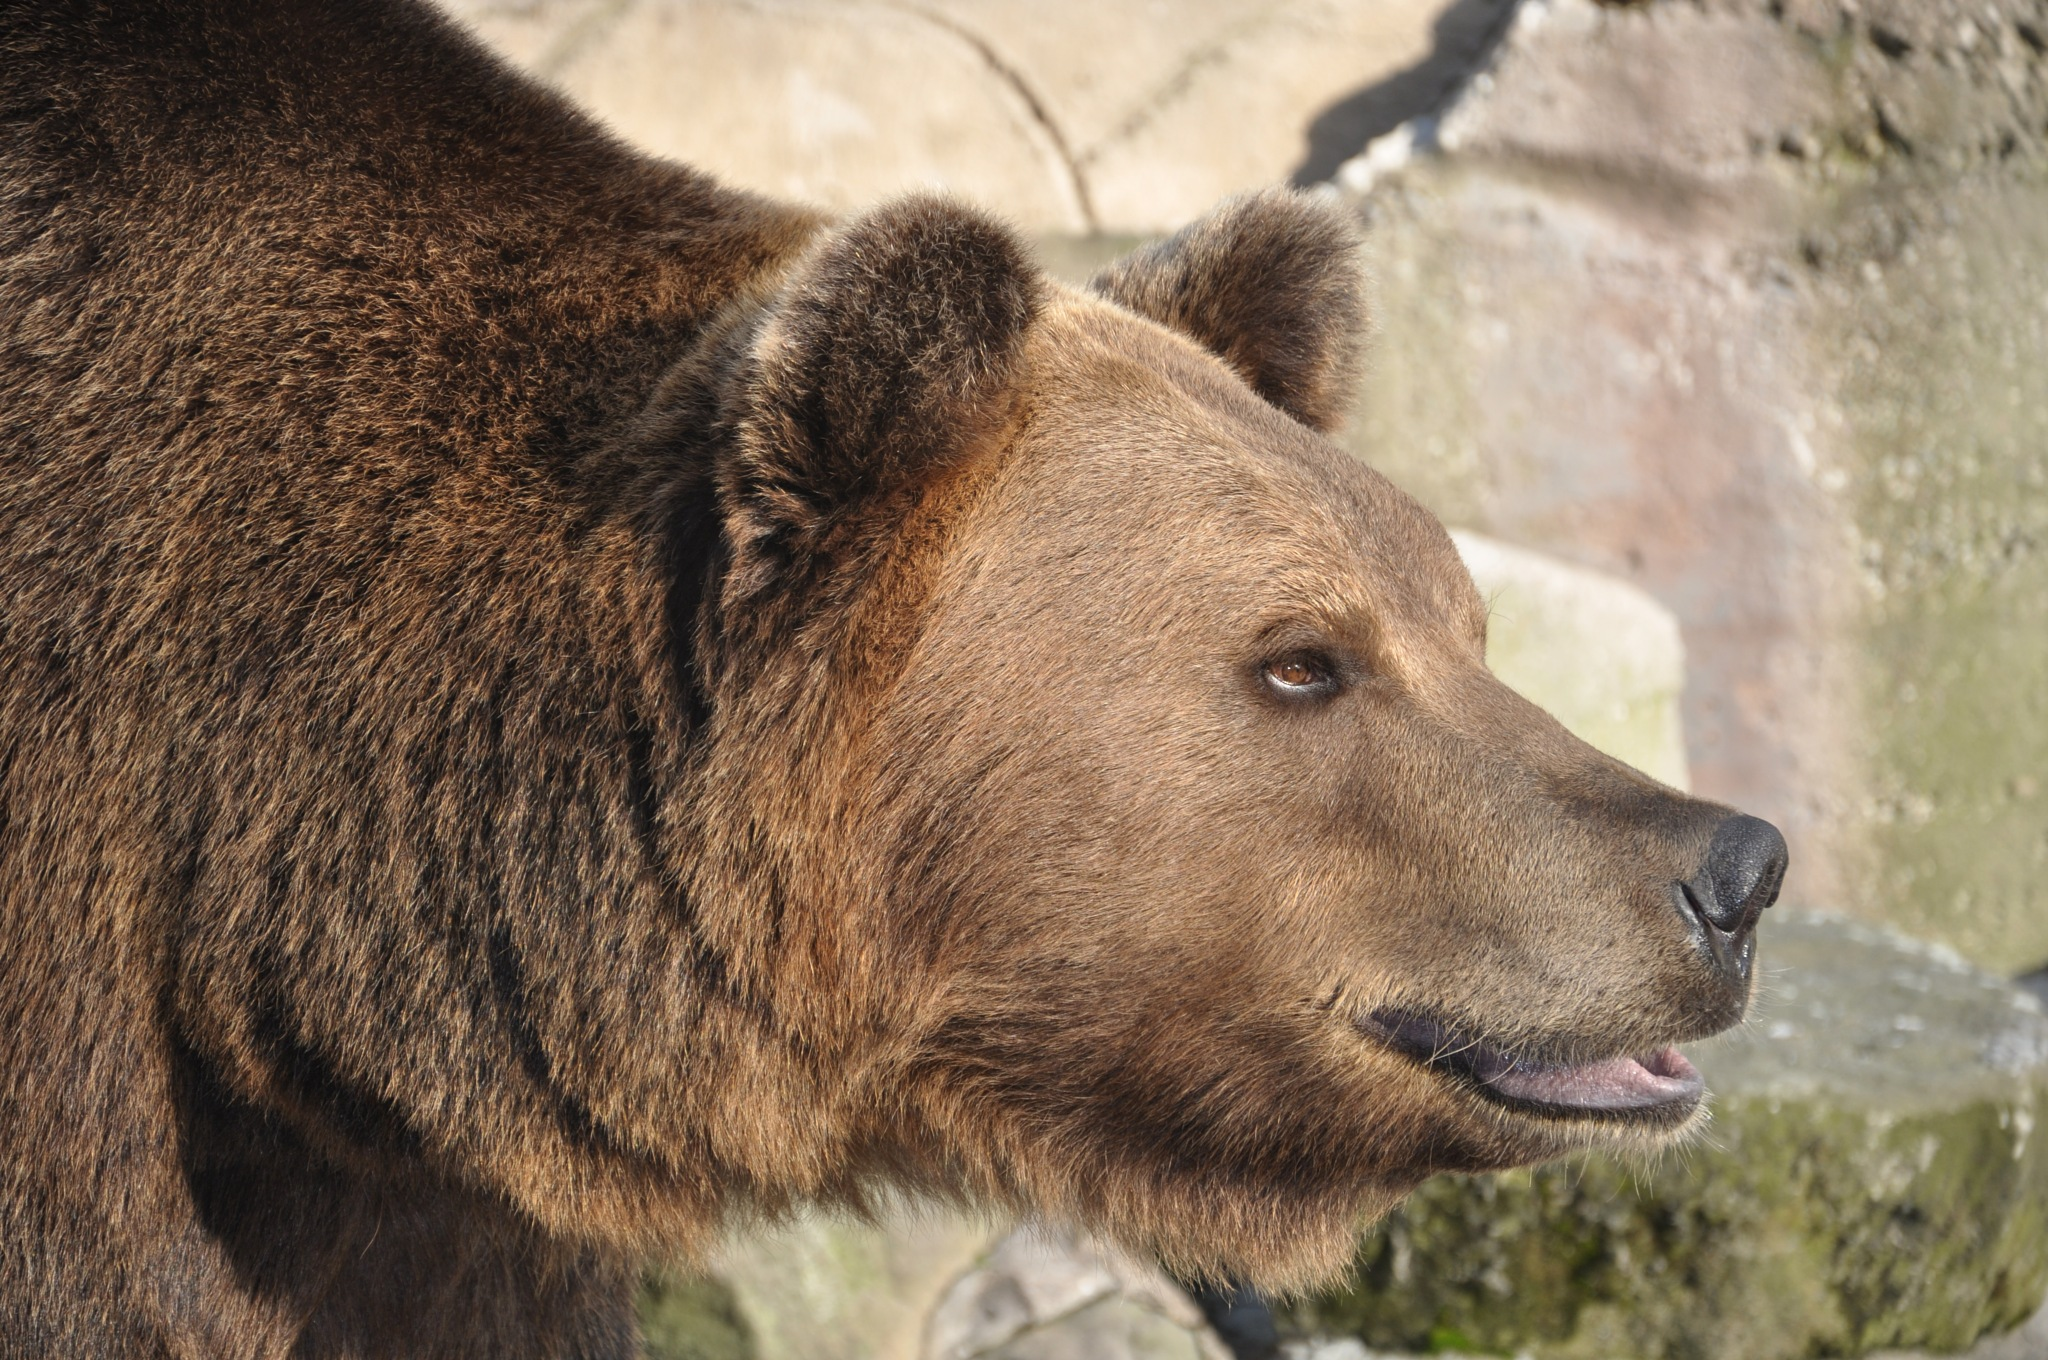 Brown bear by Anna Pronenko